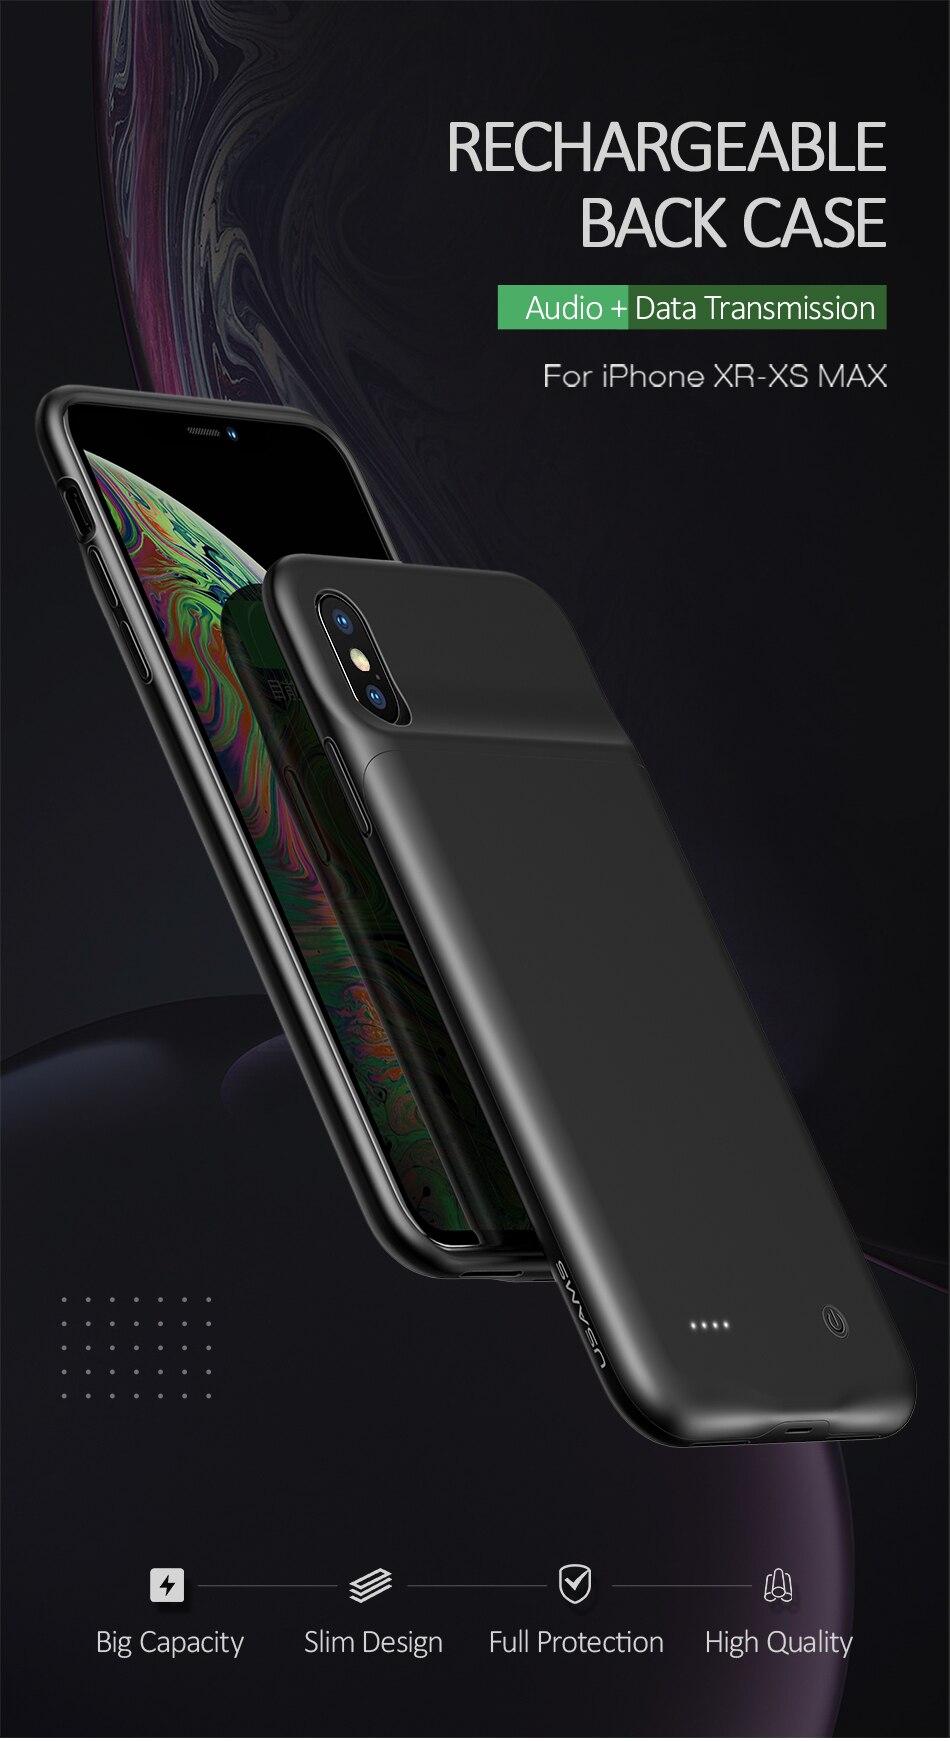 20181025-iPhone-XR-XS-MAX-US-CD68US-CD69-(1)_01